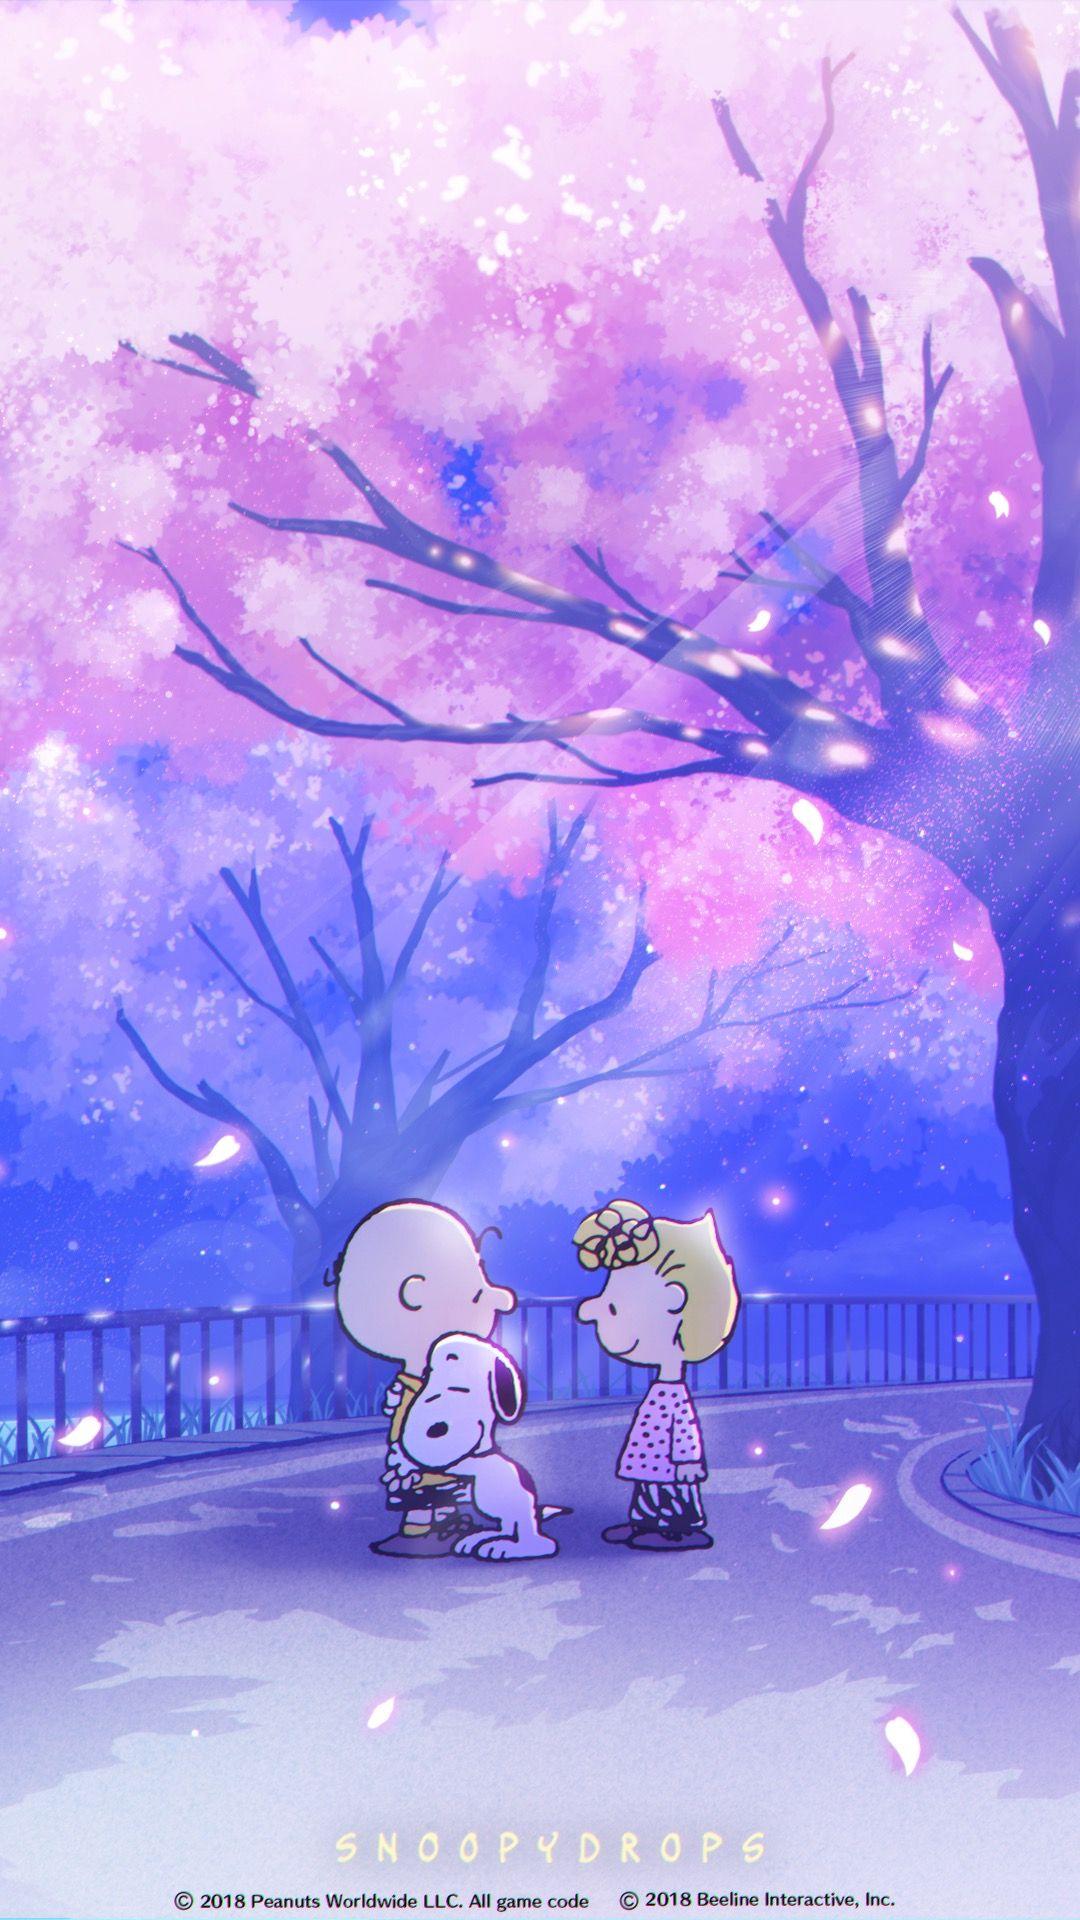 Snoopy スヌーピー 壁紙 桜 スヌーピーの壁紙 壁紙 春 綺麗なイラスト壁紙背景